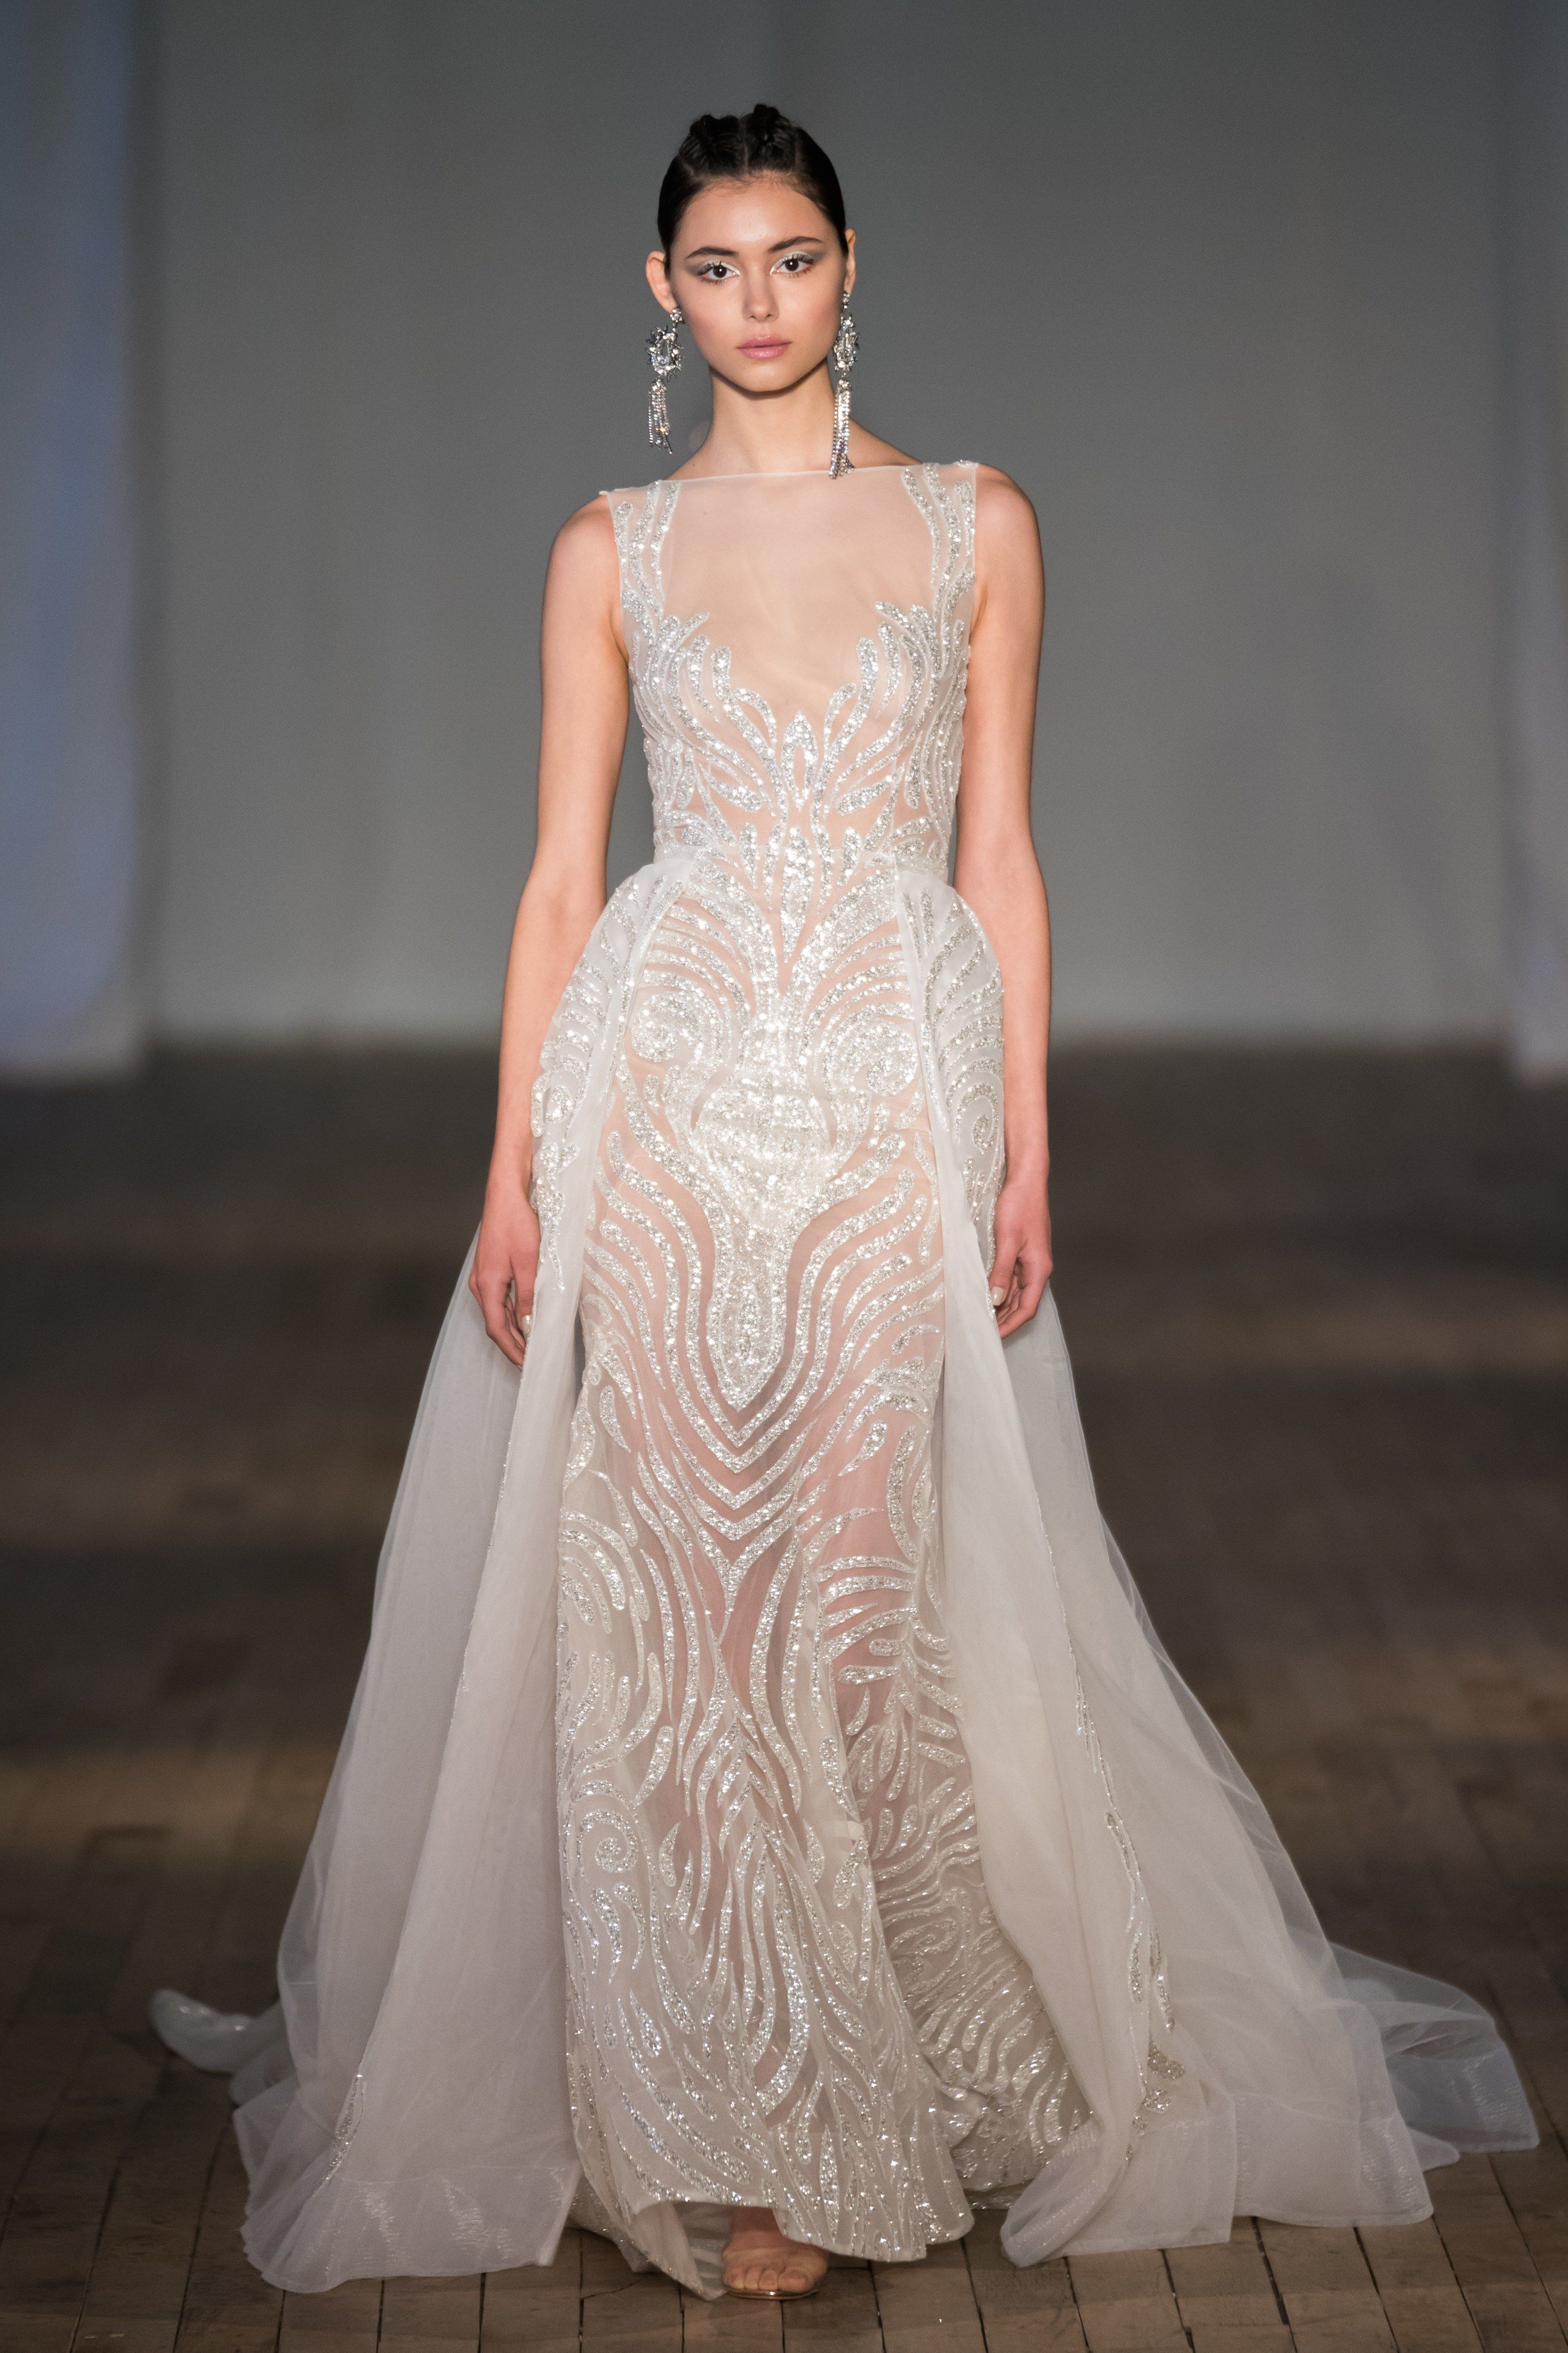 Berta Bridal & Wedding Dress Collection Spring 2019 | Brides | Berta ...